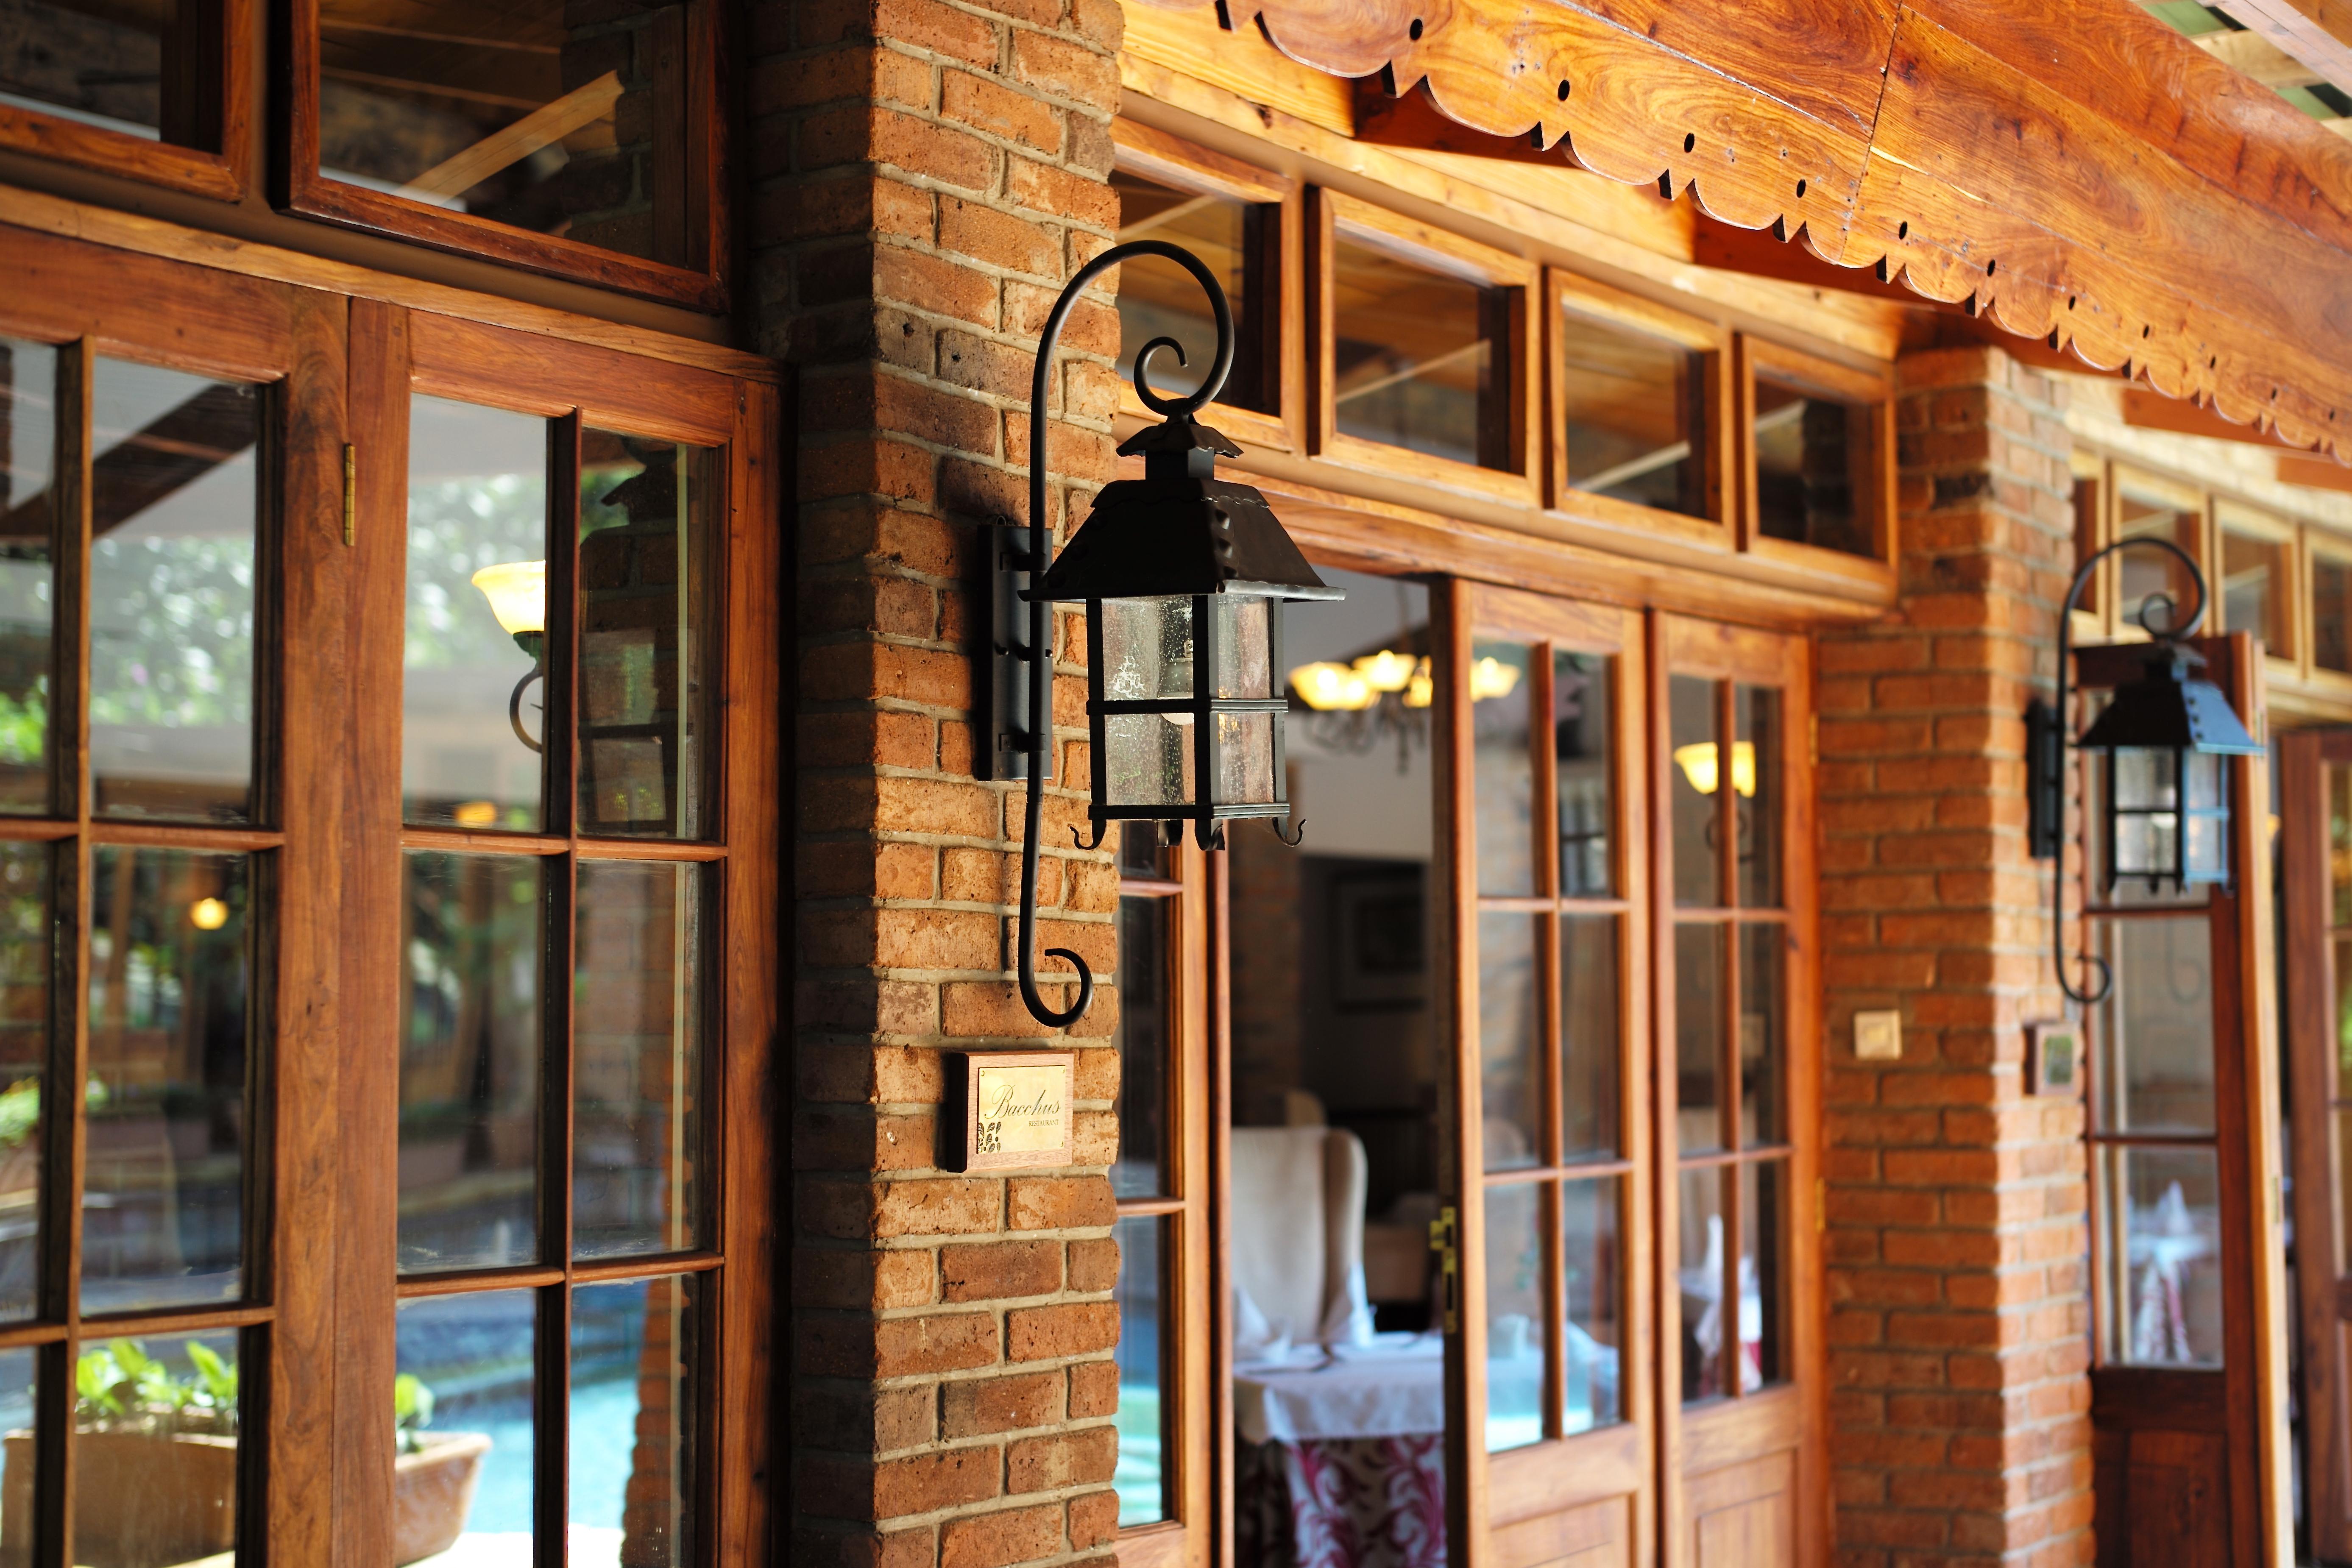 Superb ... Home, Porch, Lantern, Africa, Facade, Door, Interior Design, M, F14,  Hotel, 50, Carved, Tanzania, Style, Iron, Lodge, Estate, Leica, 240,  Summilux, Typ, ...